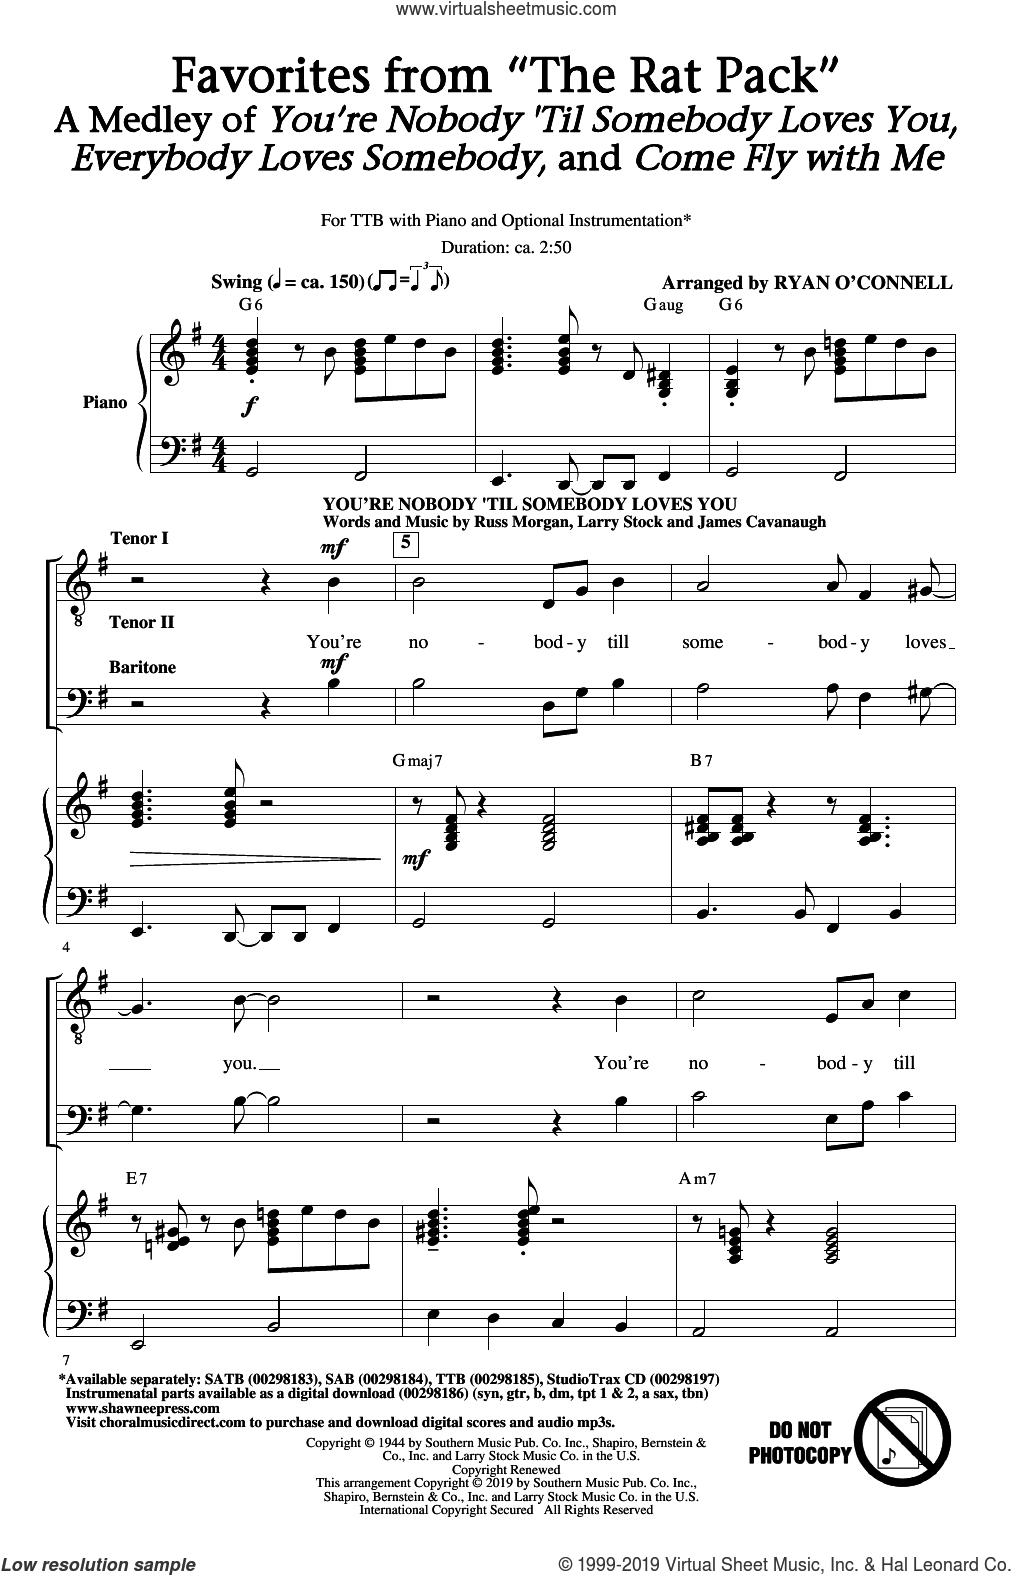 Favorites from 'The Rat Pack' (arr. Ryan O'Connell) sheet music for choir (TTBB: tenor, bass) by The Rat Pack, Irving Taylor, James Cavanaugh, Jimmy van Heusen, Ken Lane, Larry Stock, Russ Morgan and Sammy Cahn, intermediate skill level